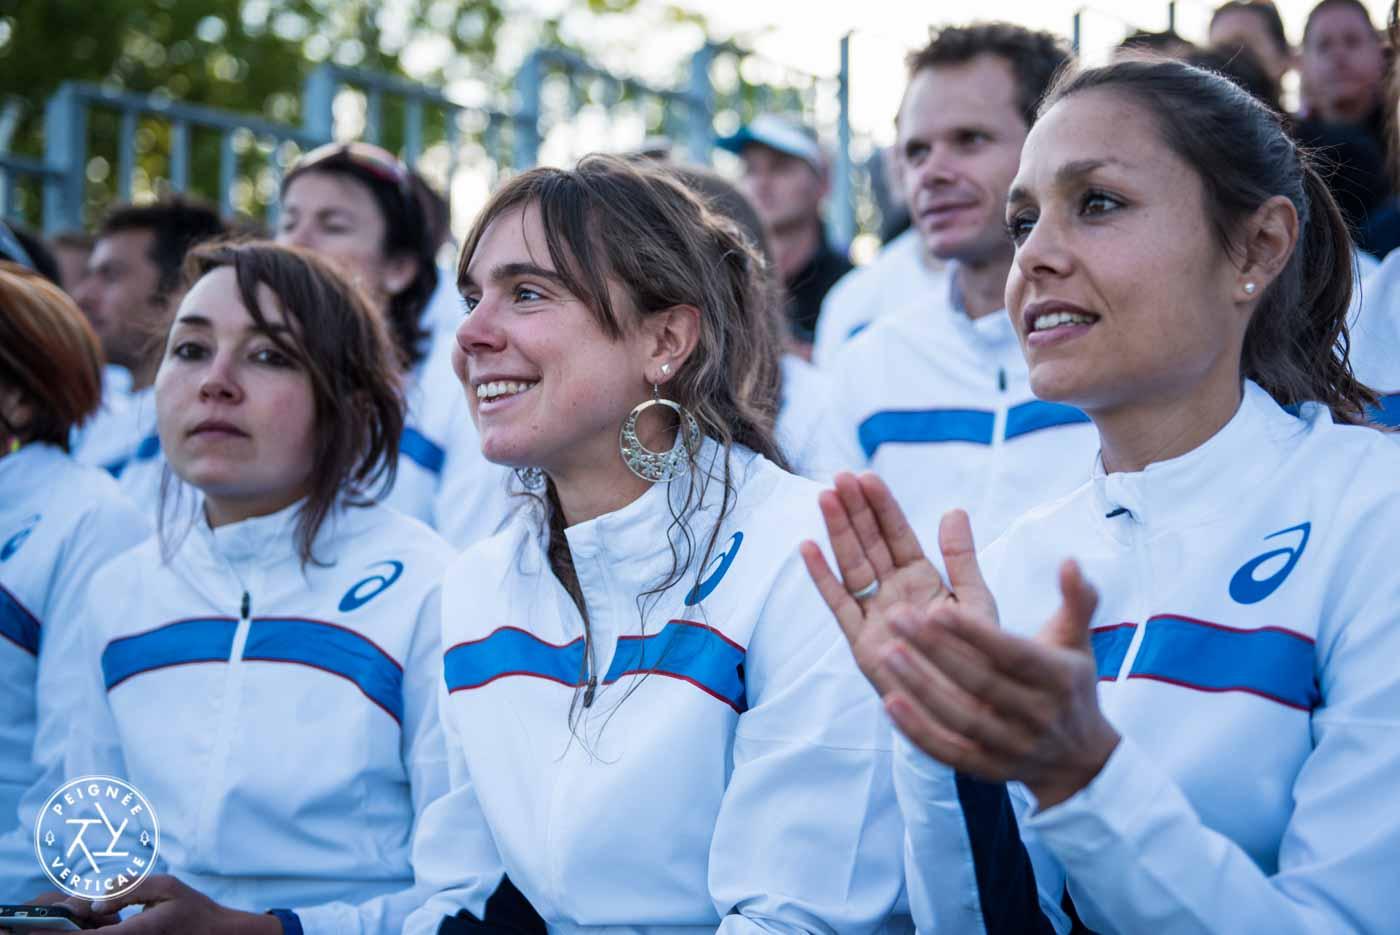 Clients-Maxi-Race-2015-Timothee-Nalet-Photographe-5560.jpg